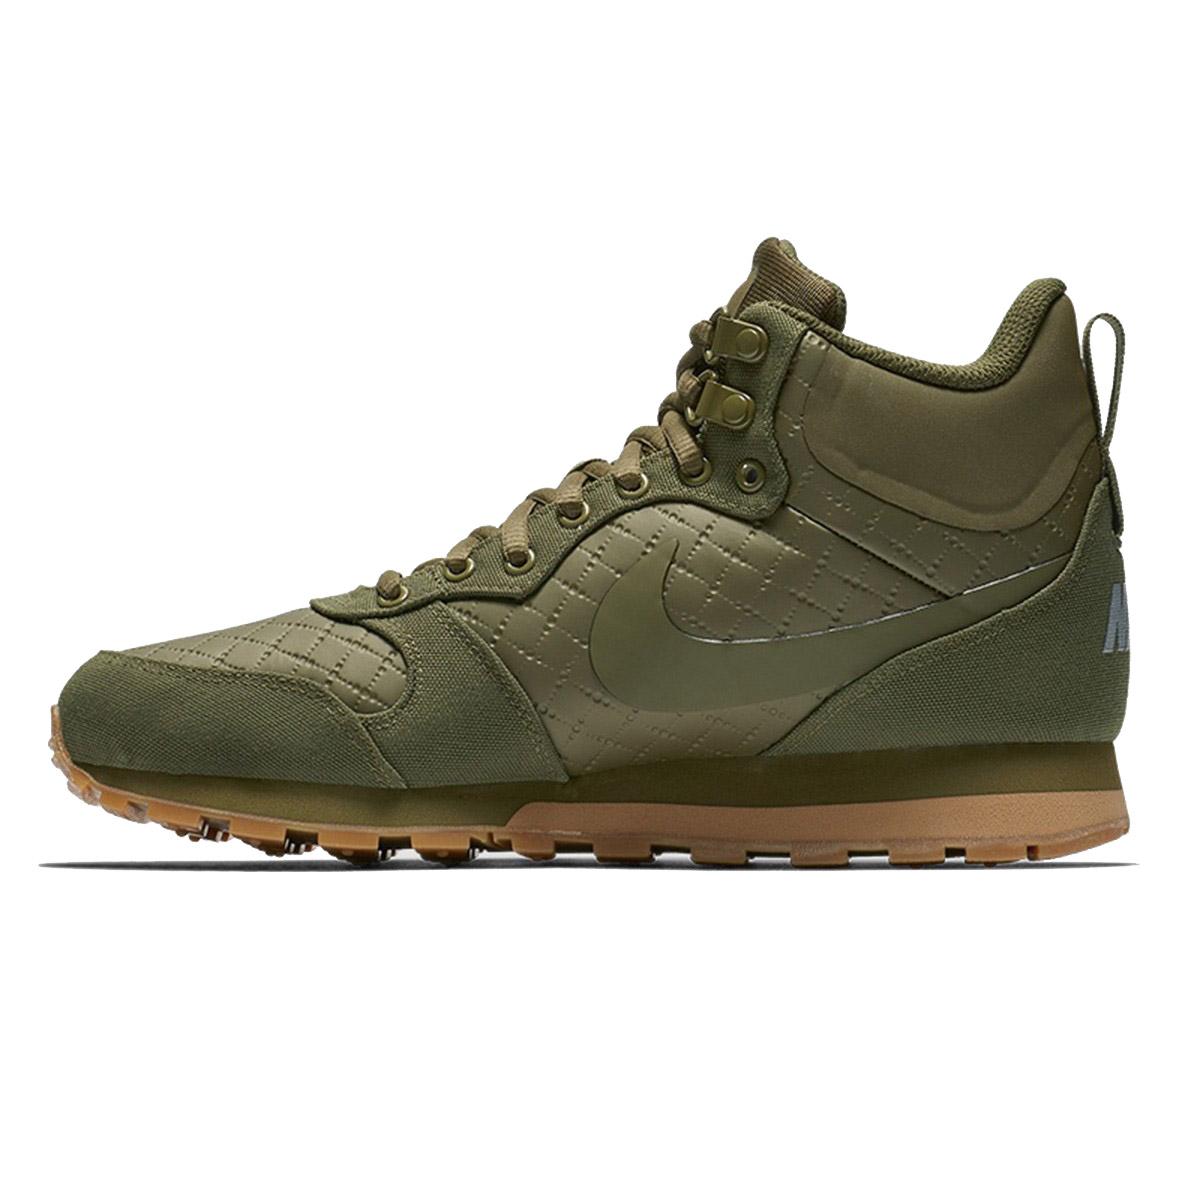 کفش راحتی نایکی مدل MD RUNNER 2 MID کد ۳۰۰